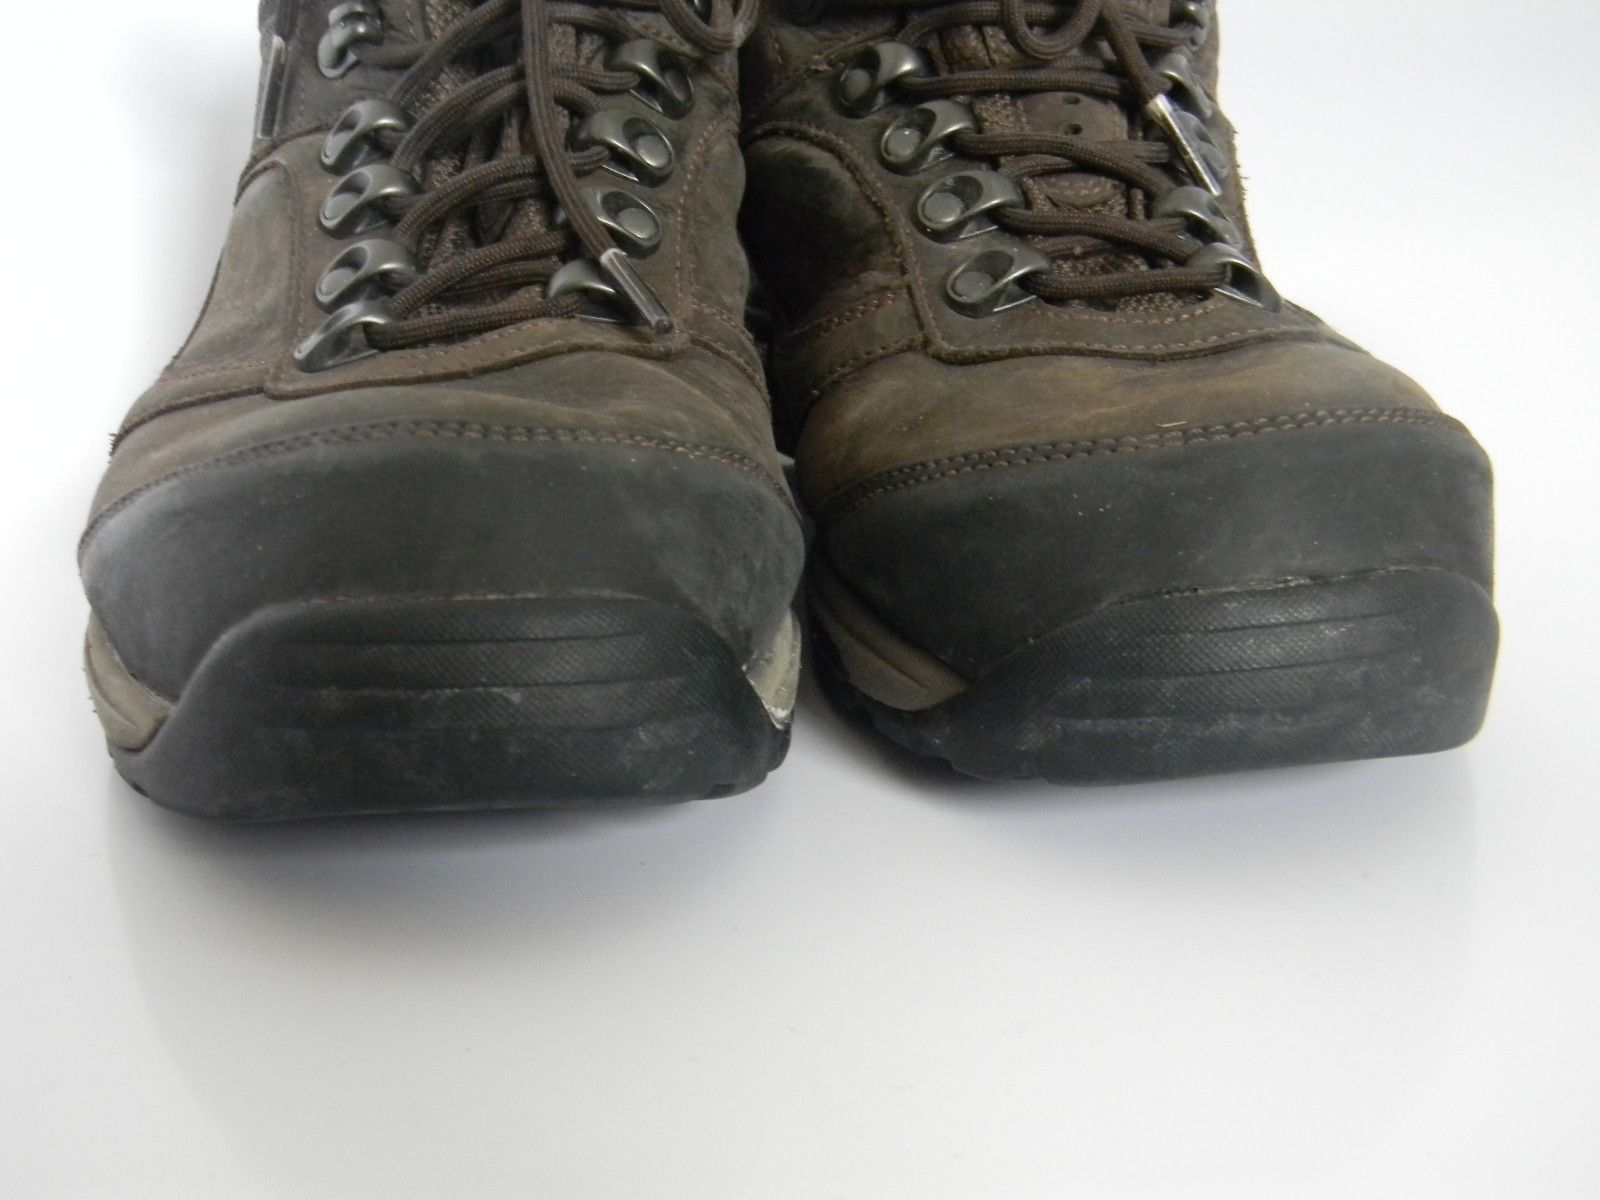 18e85db2fd3c1 Mens New Balance 978 MW978GT Brown Gore-Tex Hiking Boots Size 10.5 2E